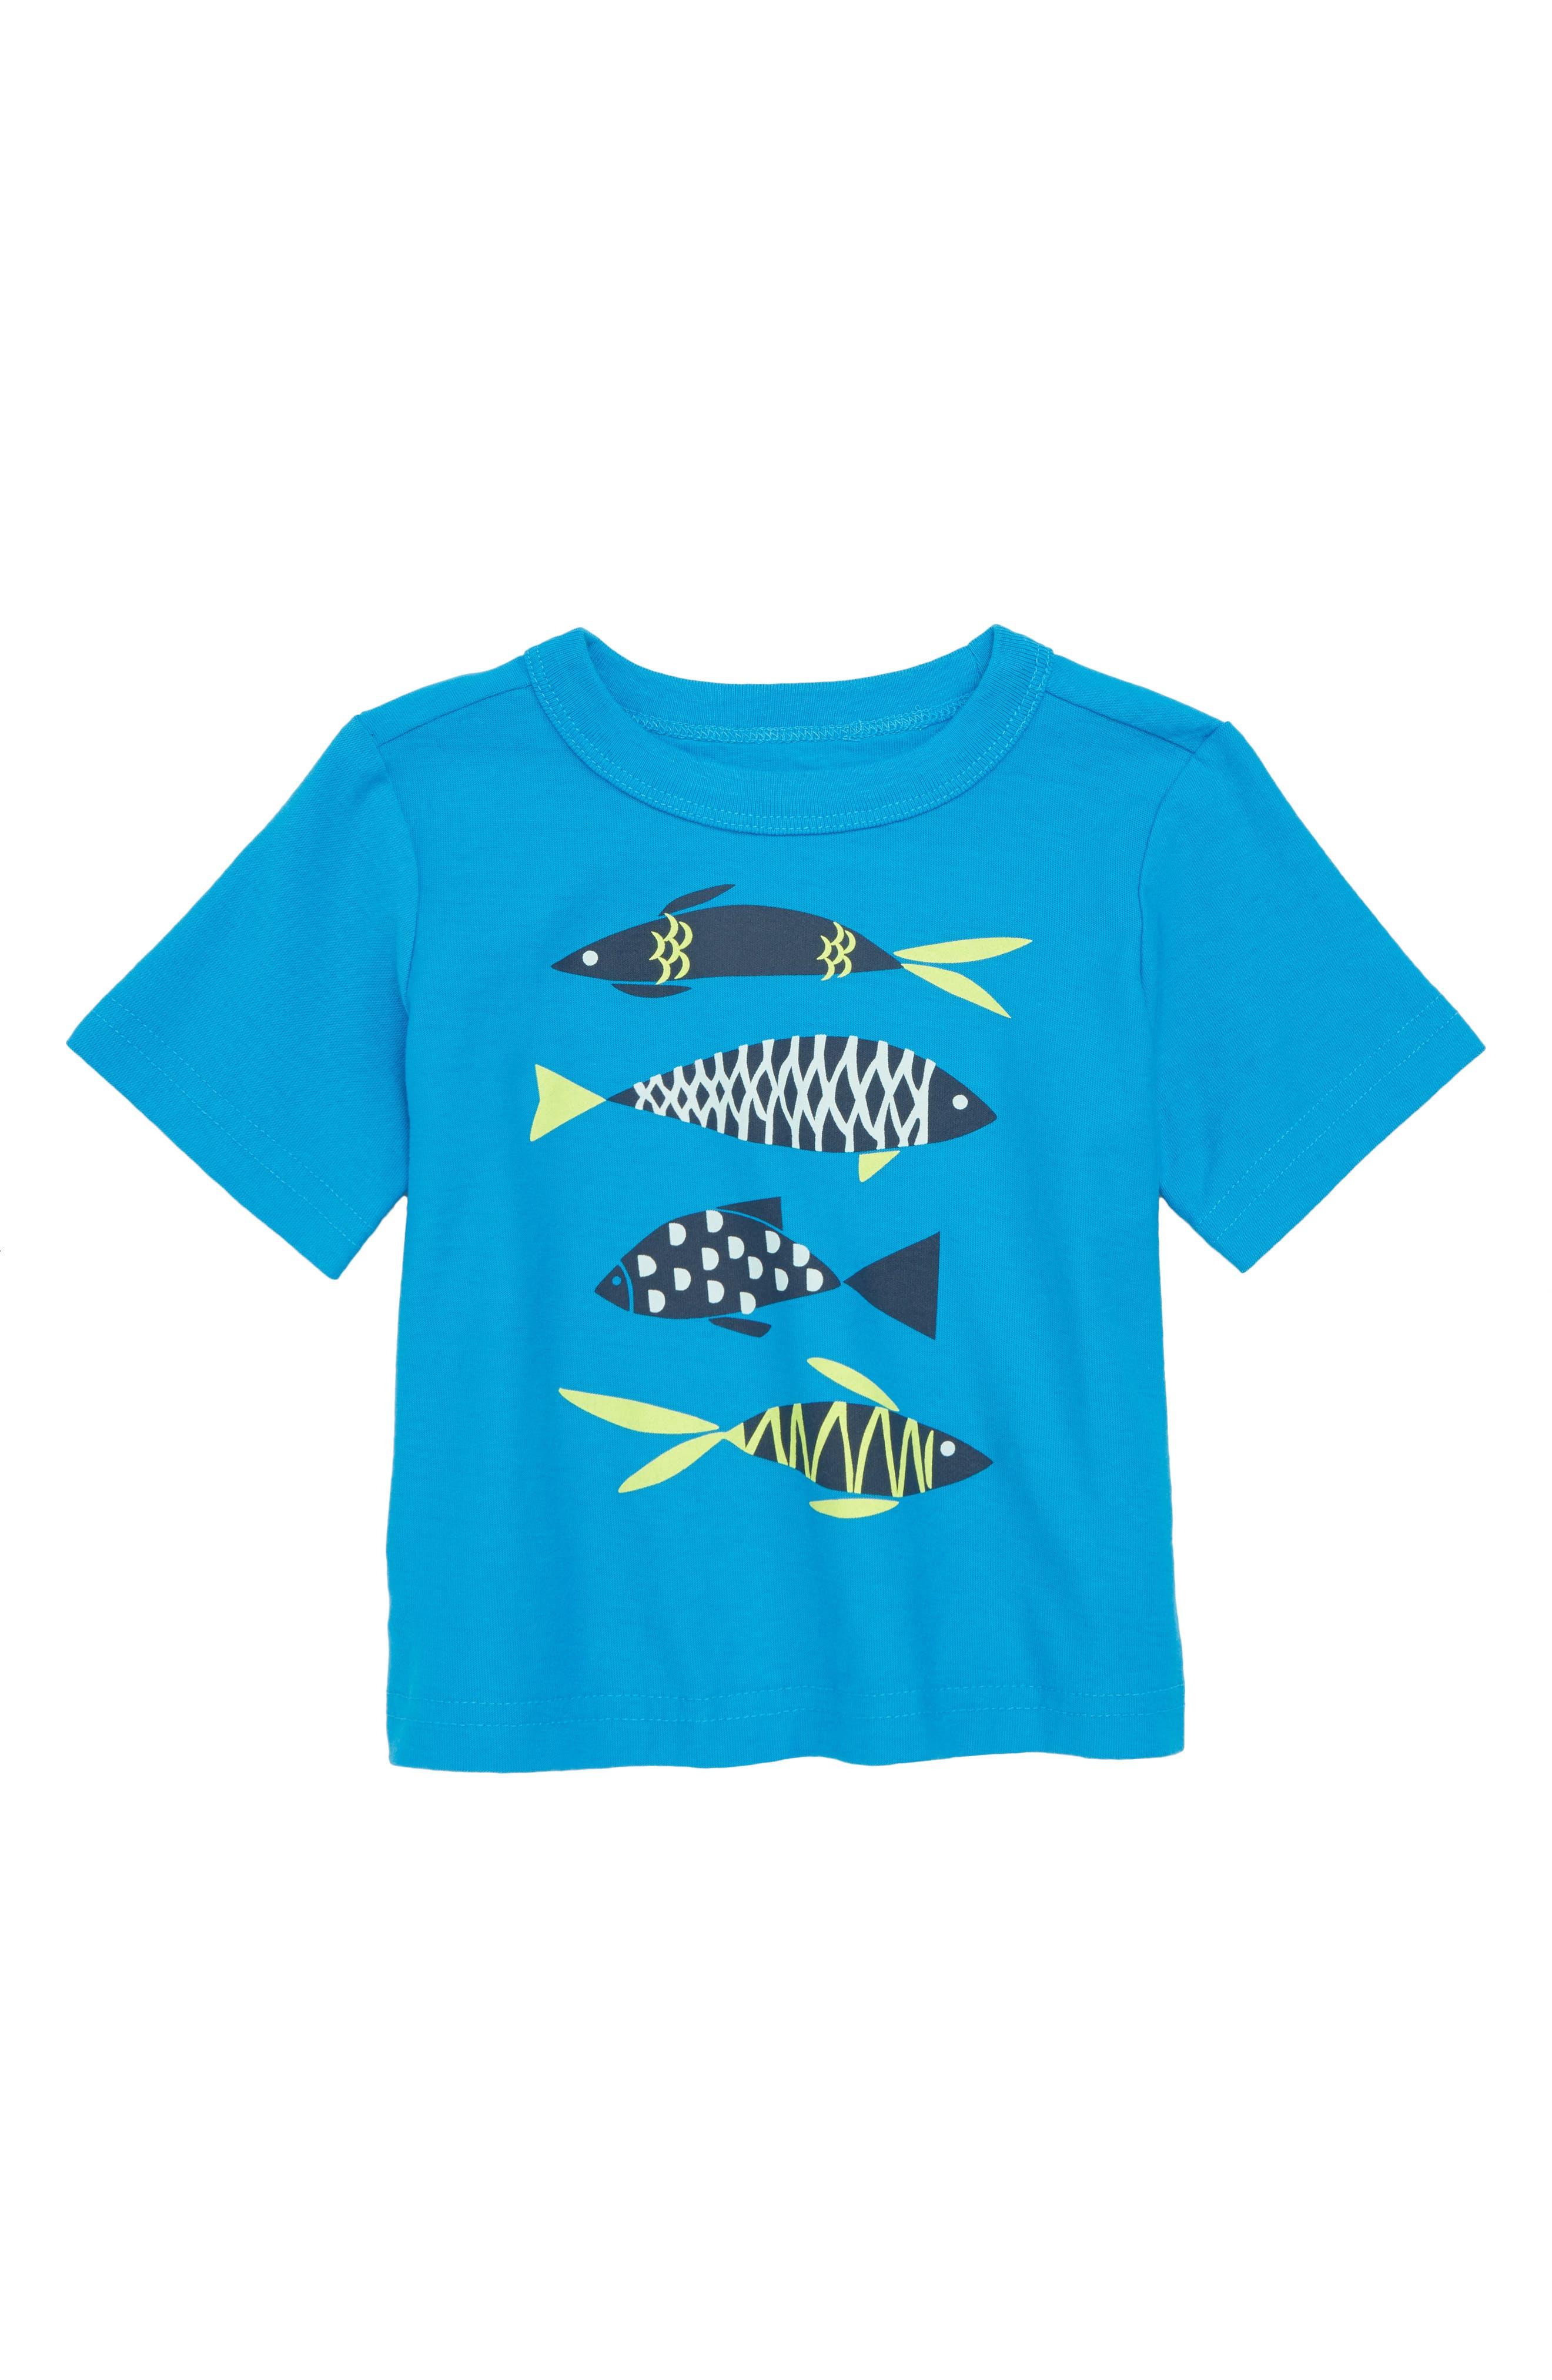 School of Fish Graphic T-Shirt,                             Main thumbnail 1, color,                             475